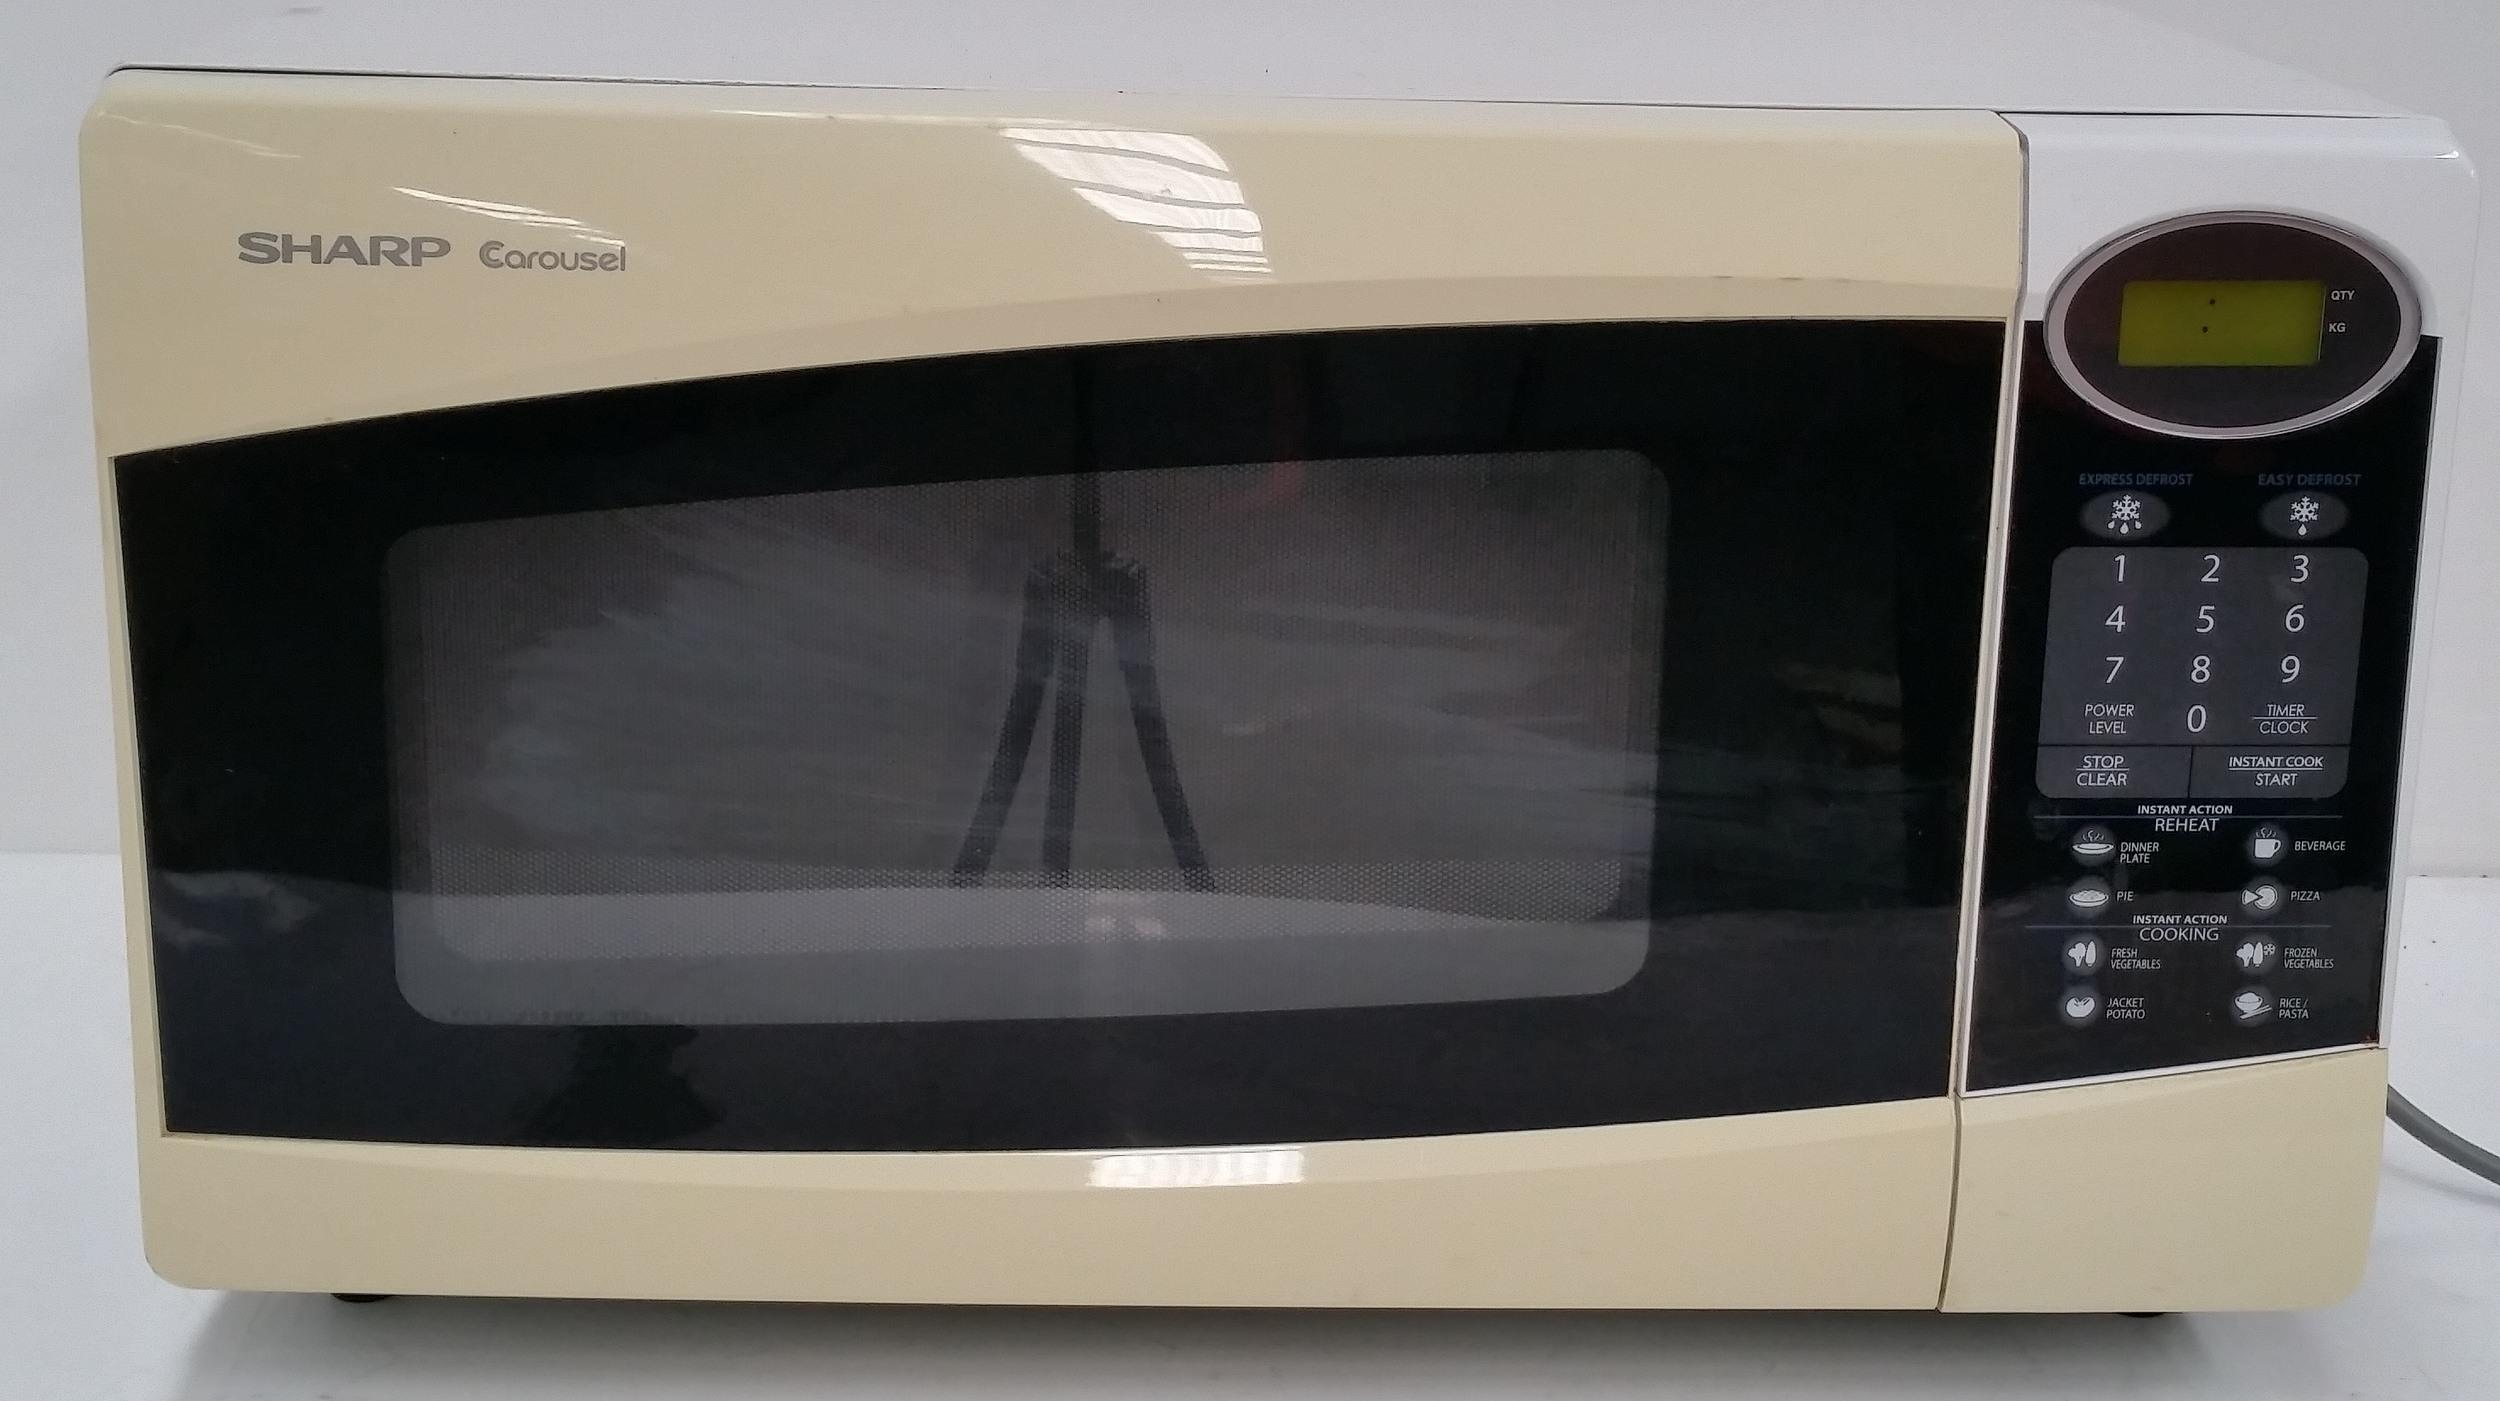 Sharp Carousel 1100 Watt Microwave Lot 1123576 Allbids